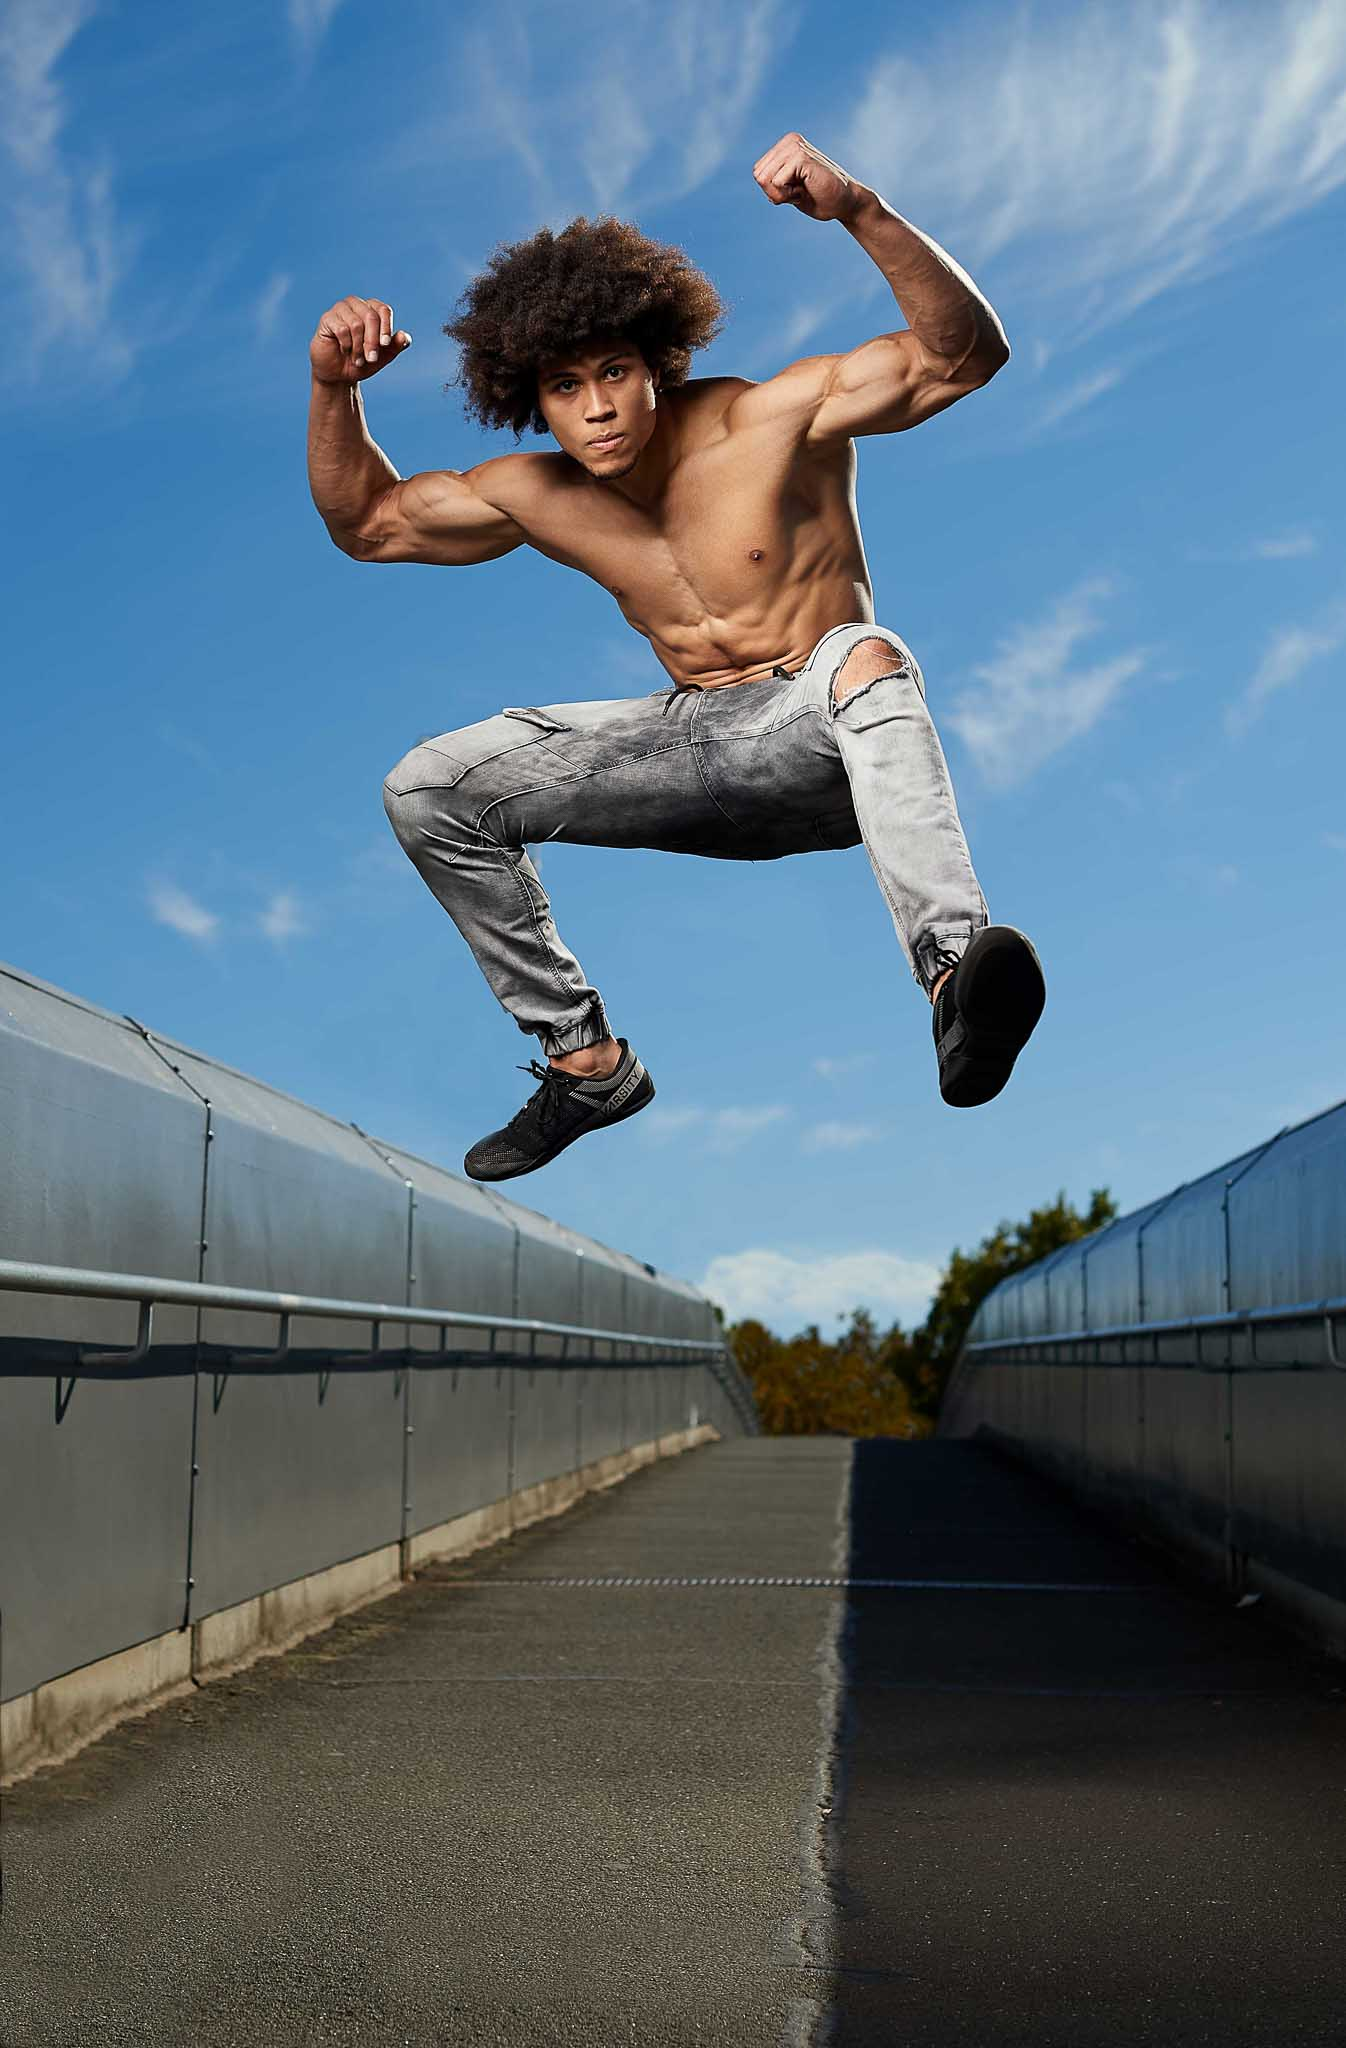 Ossie jumping high on Melbourne Bridge